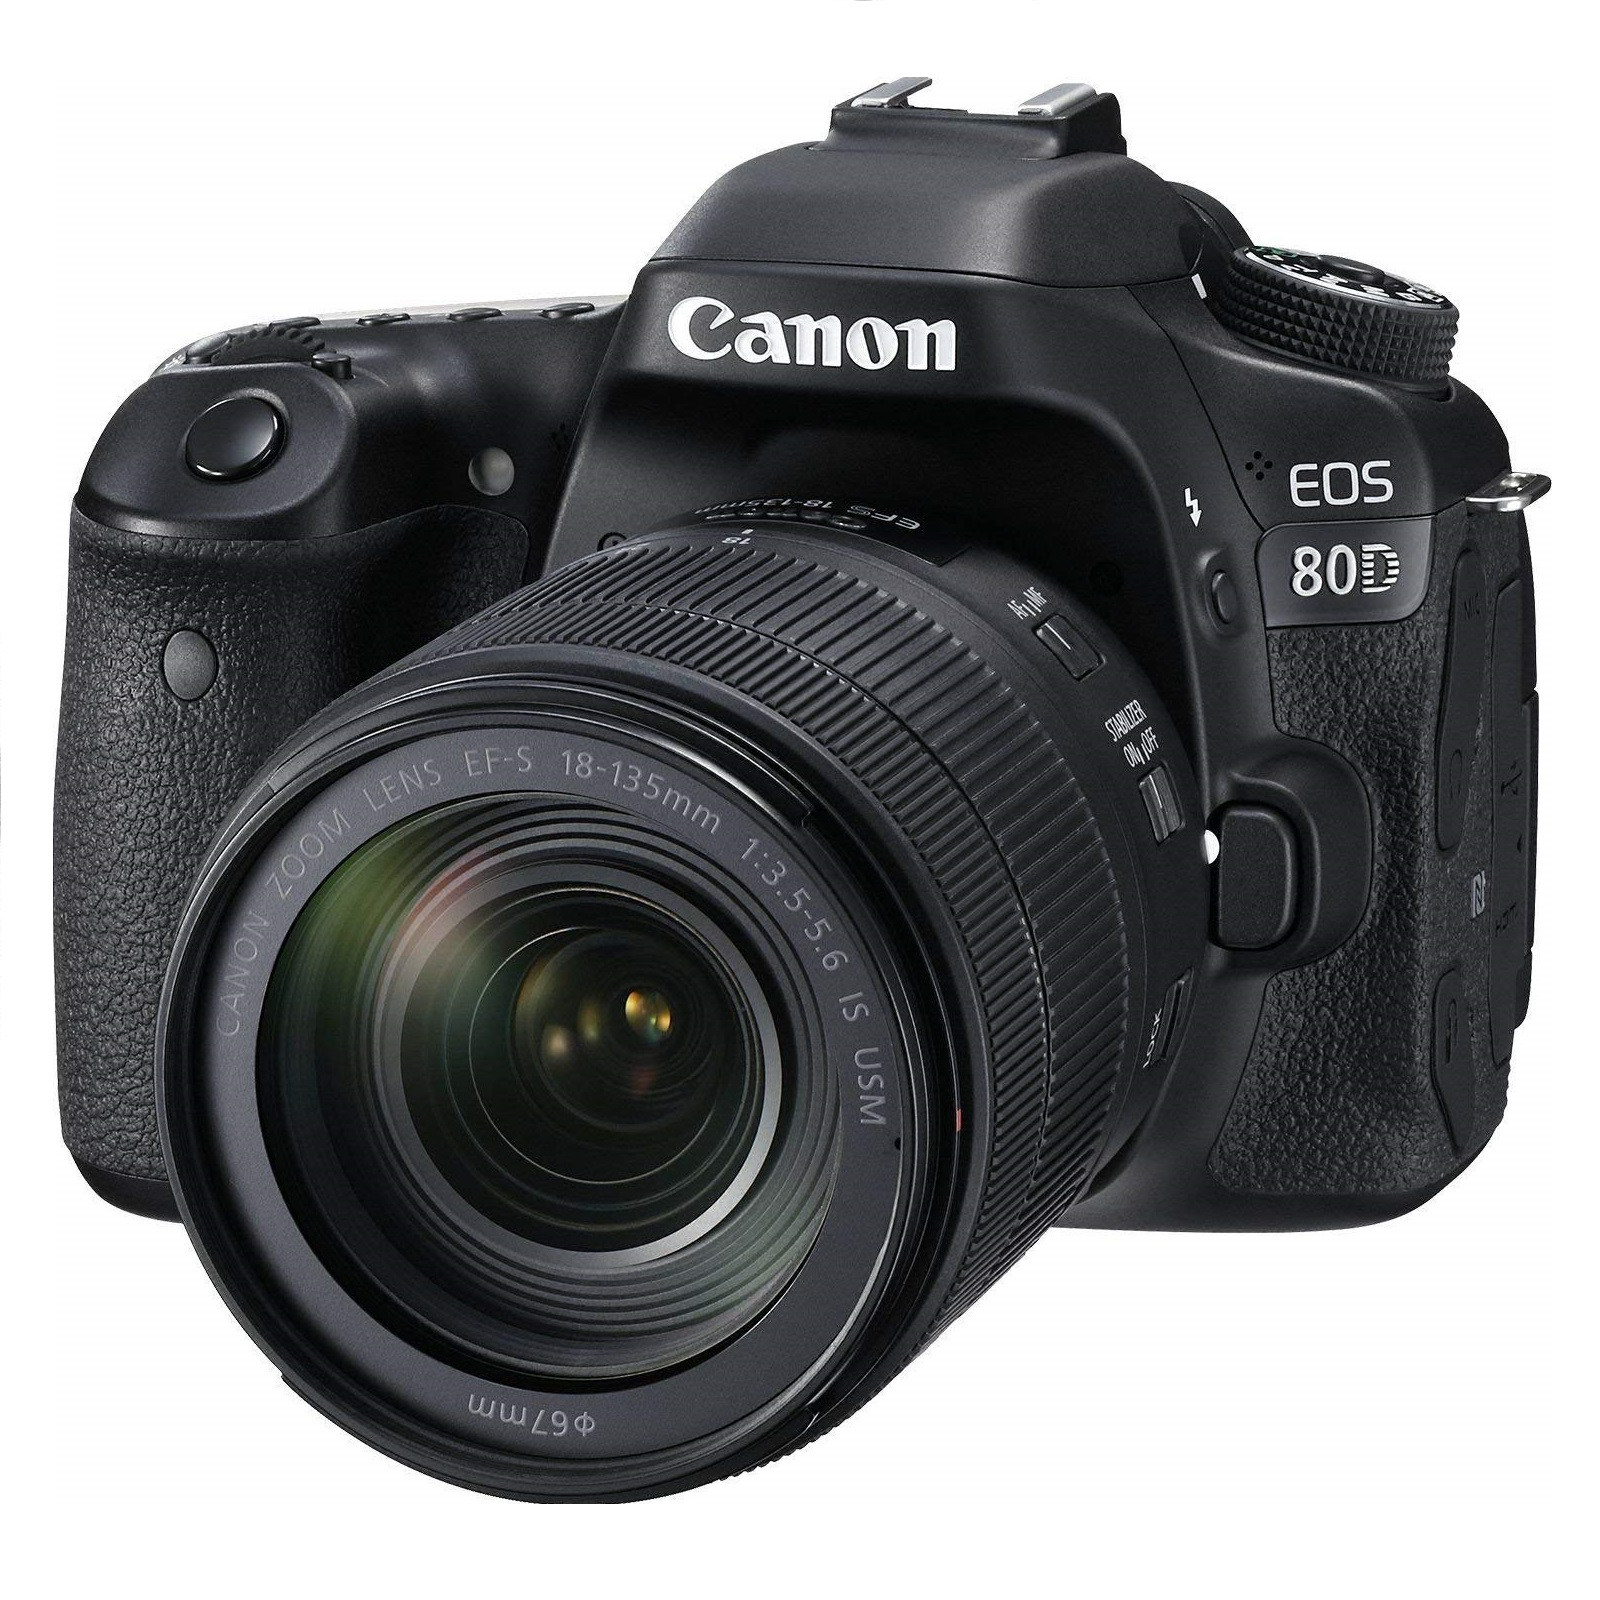 Canon EOS 80D pic1